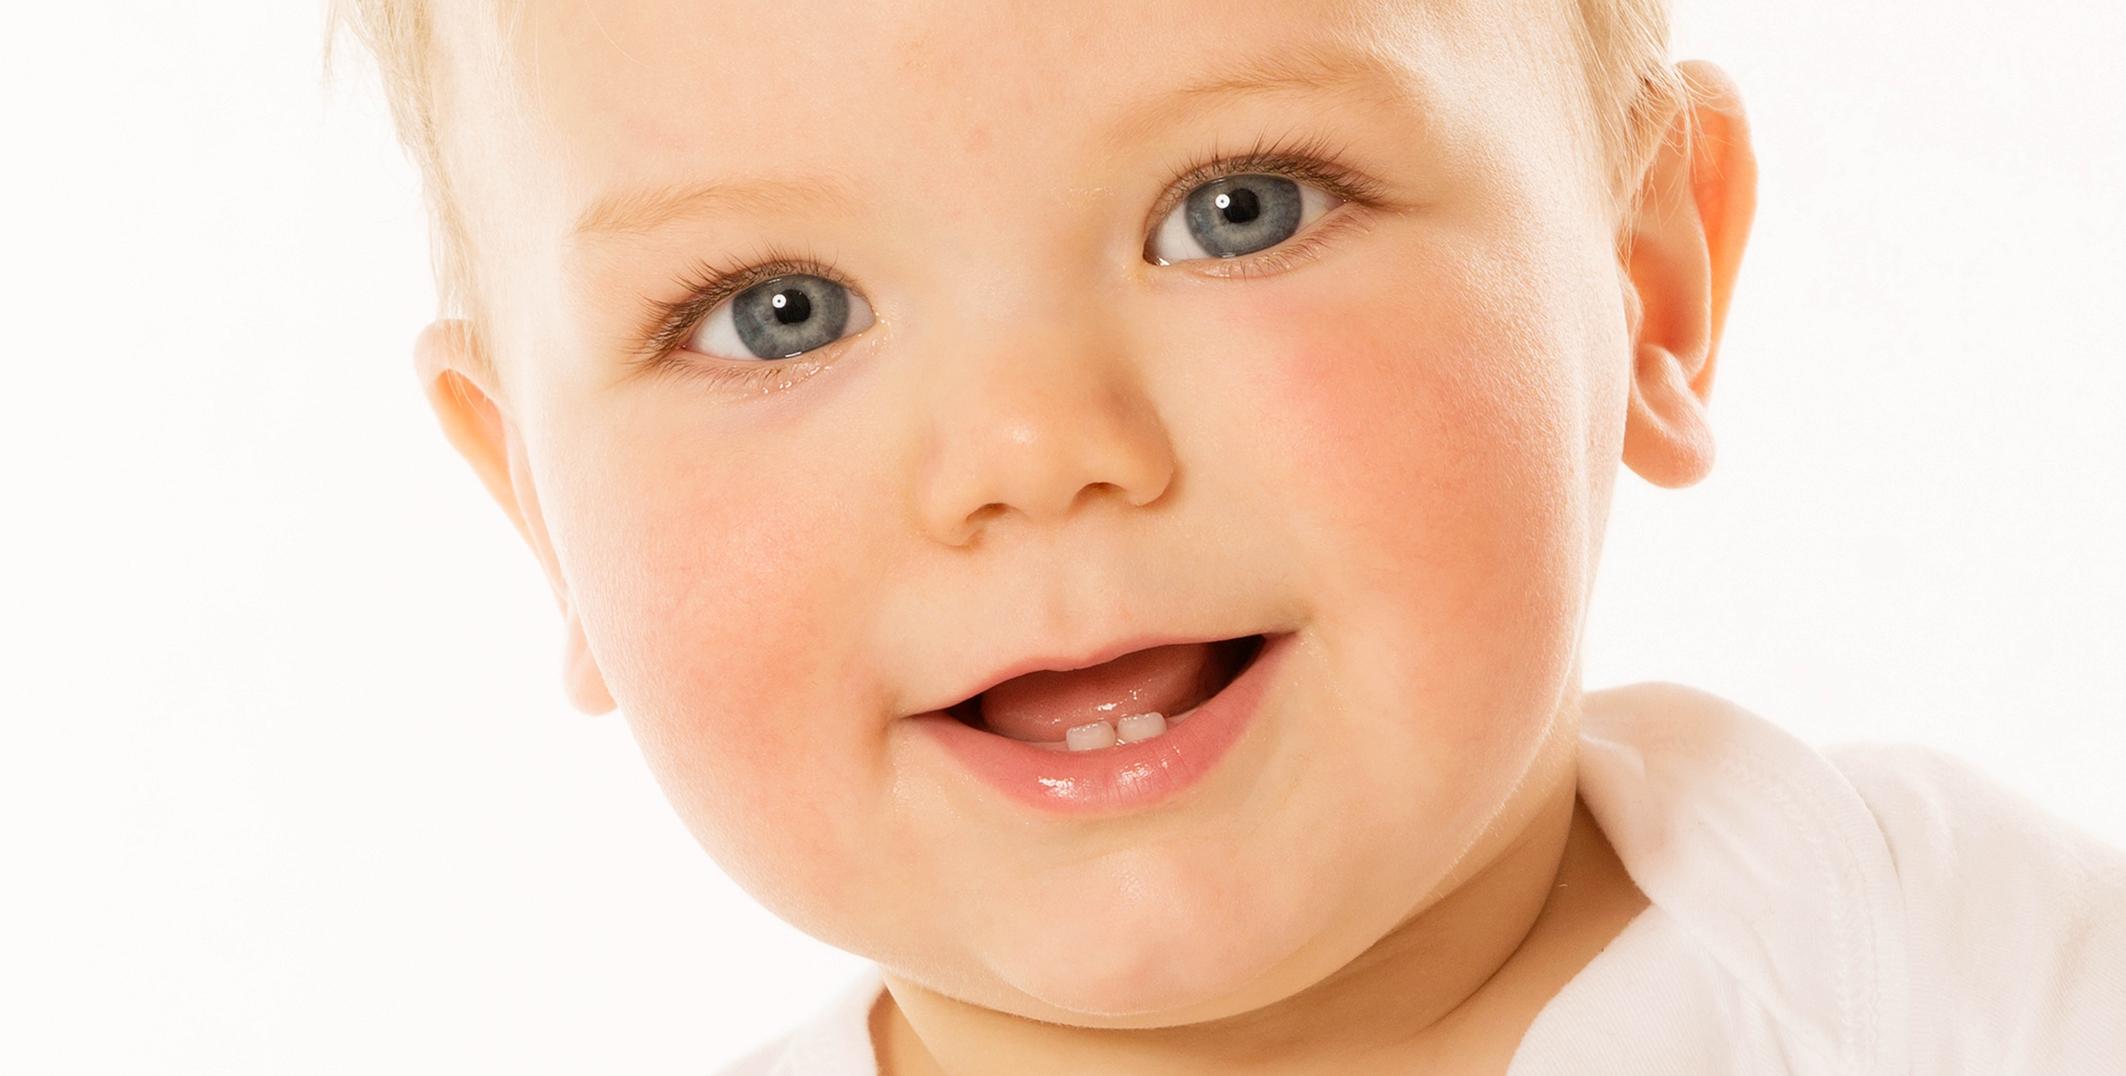 Fotostudio Wyck - Babyfoto